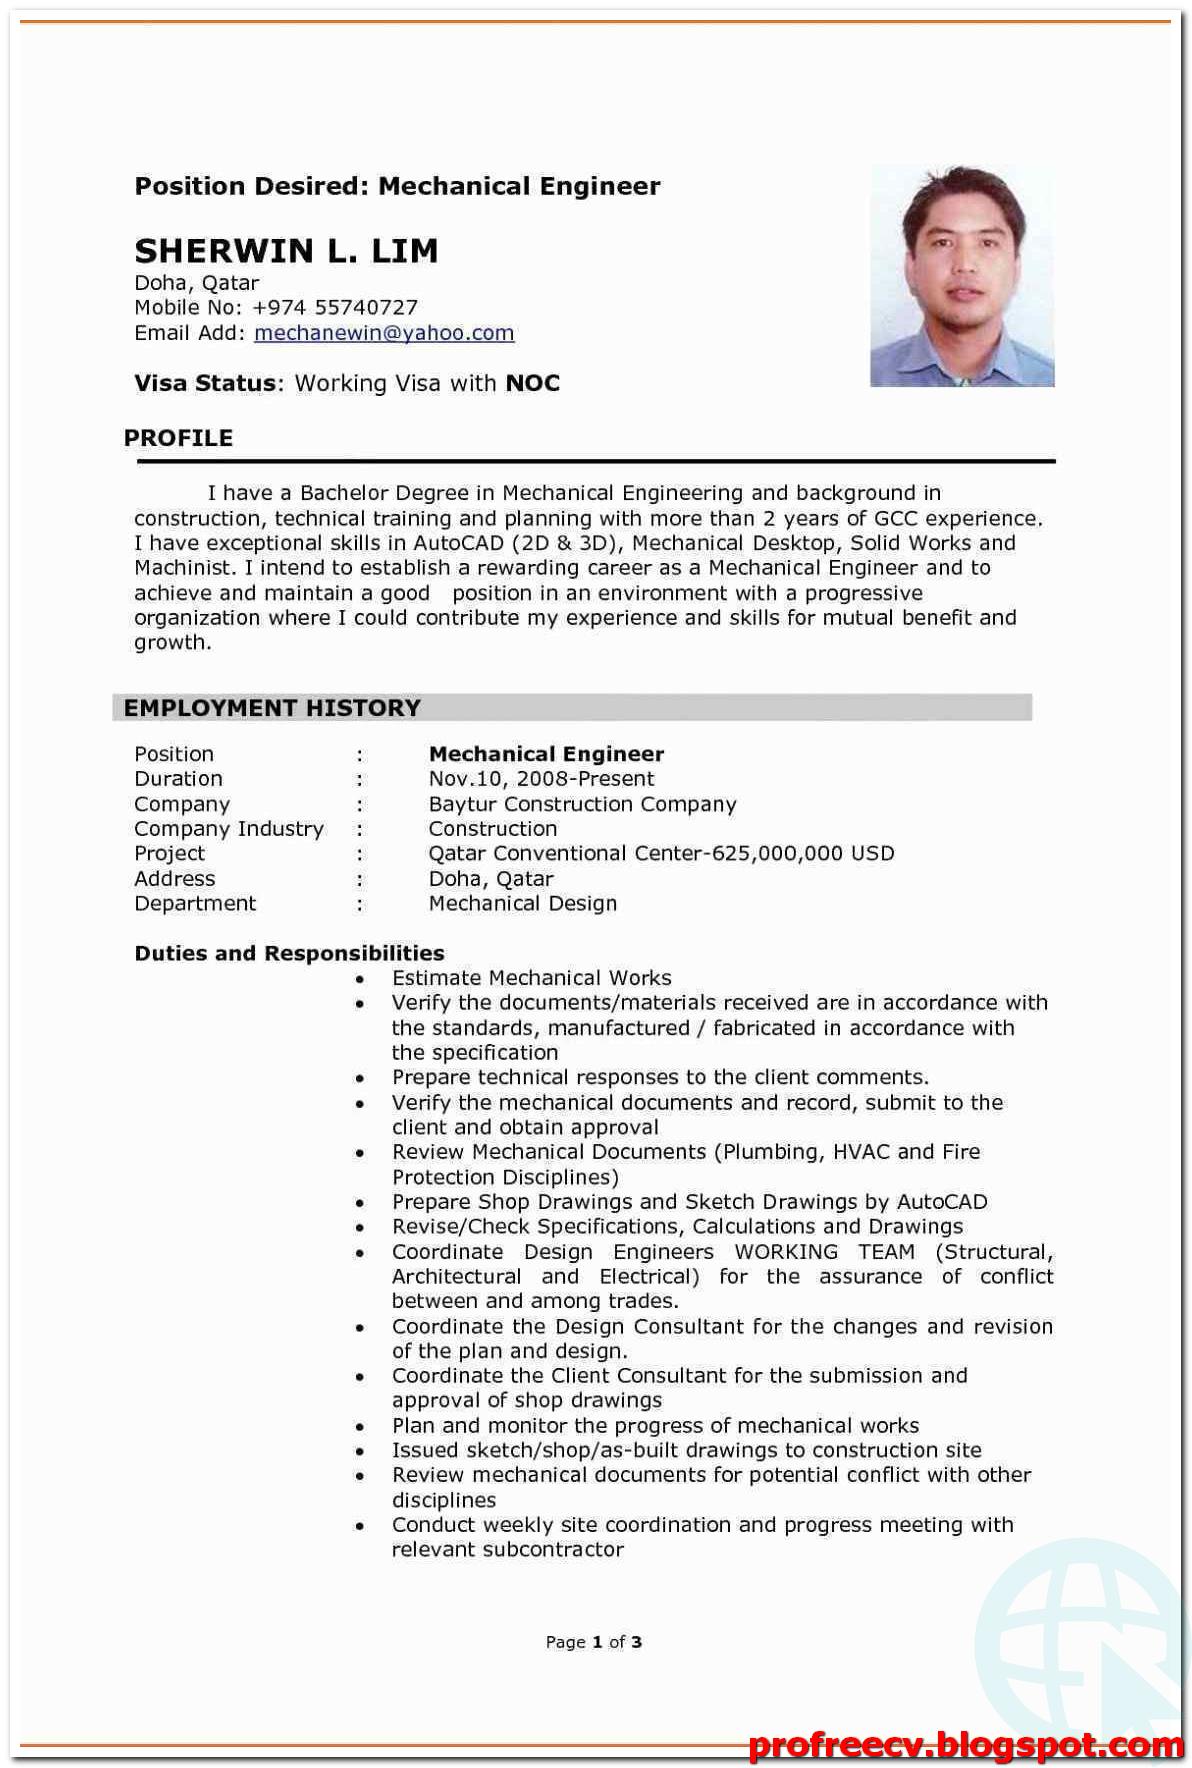 Mechanical Engineer Resume Templates 2021 Mechanical Engineer Resume Engineering Resume Resume Examples